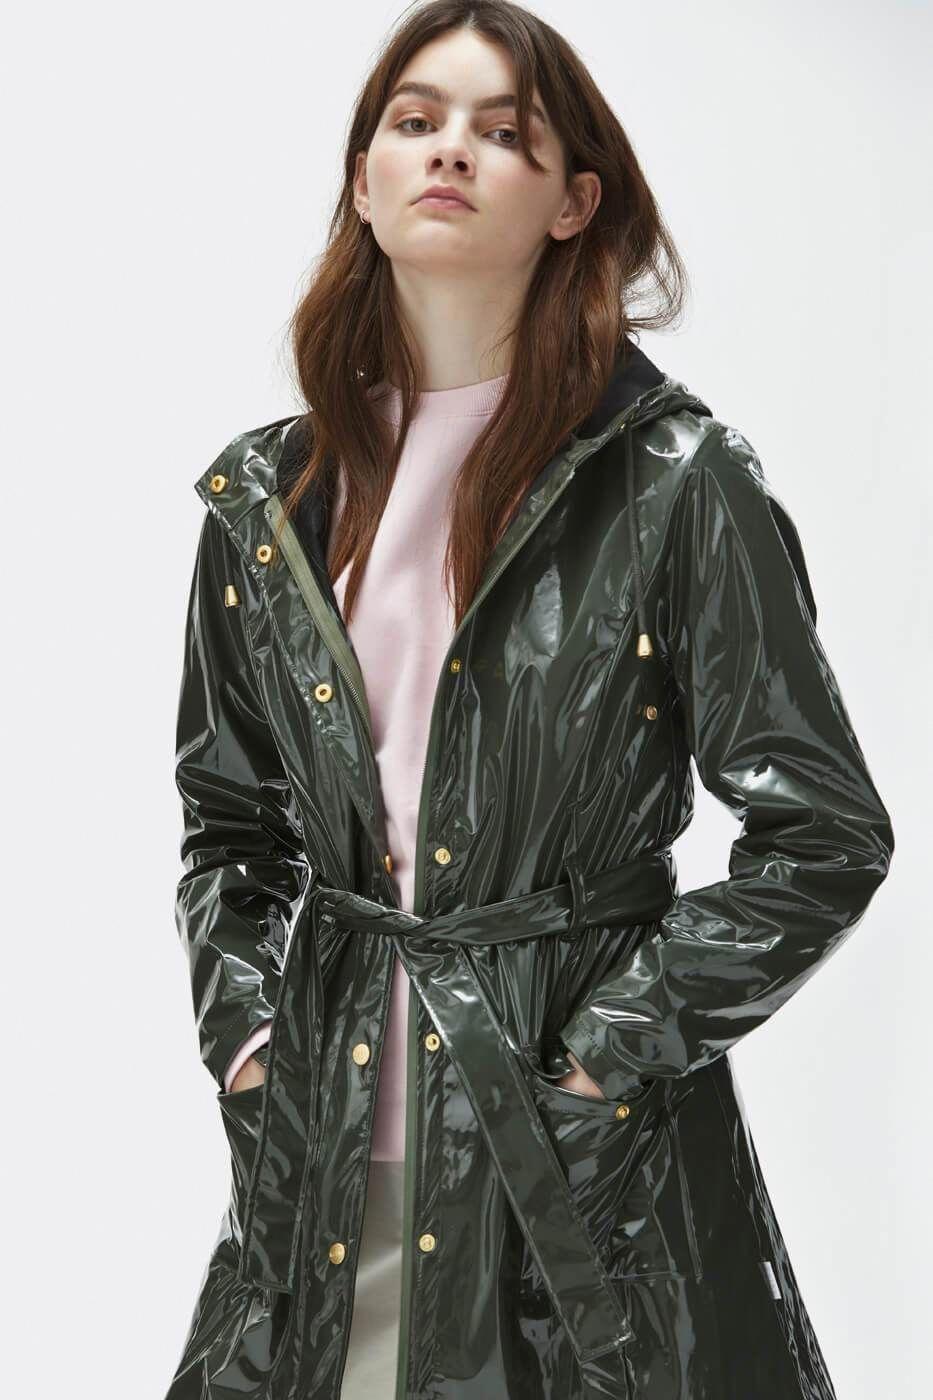 Glossy Curve Jacket   Buy Rains Glossy Curve Jacket here  FemaleRaincoat 1e0c3697cfab